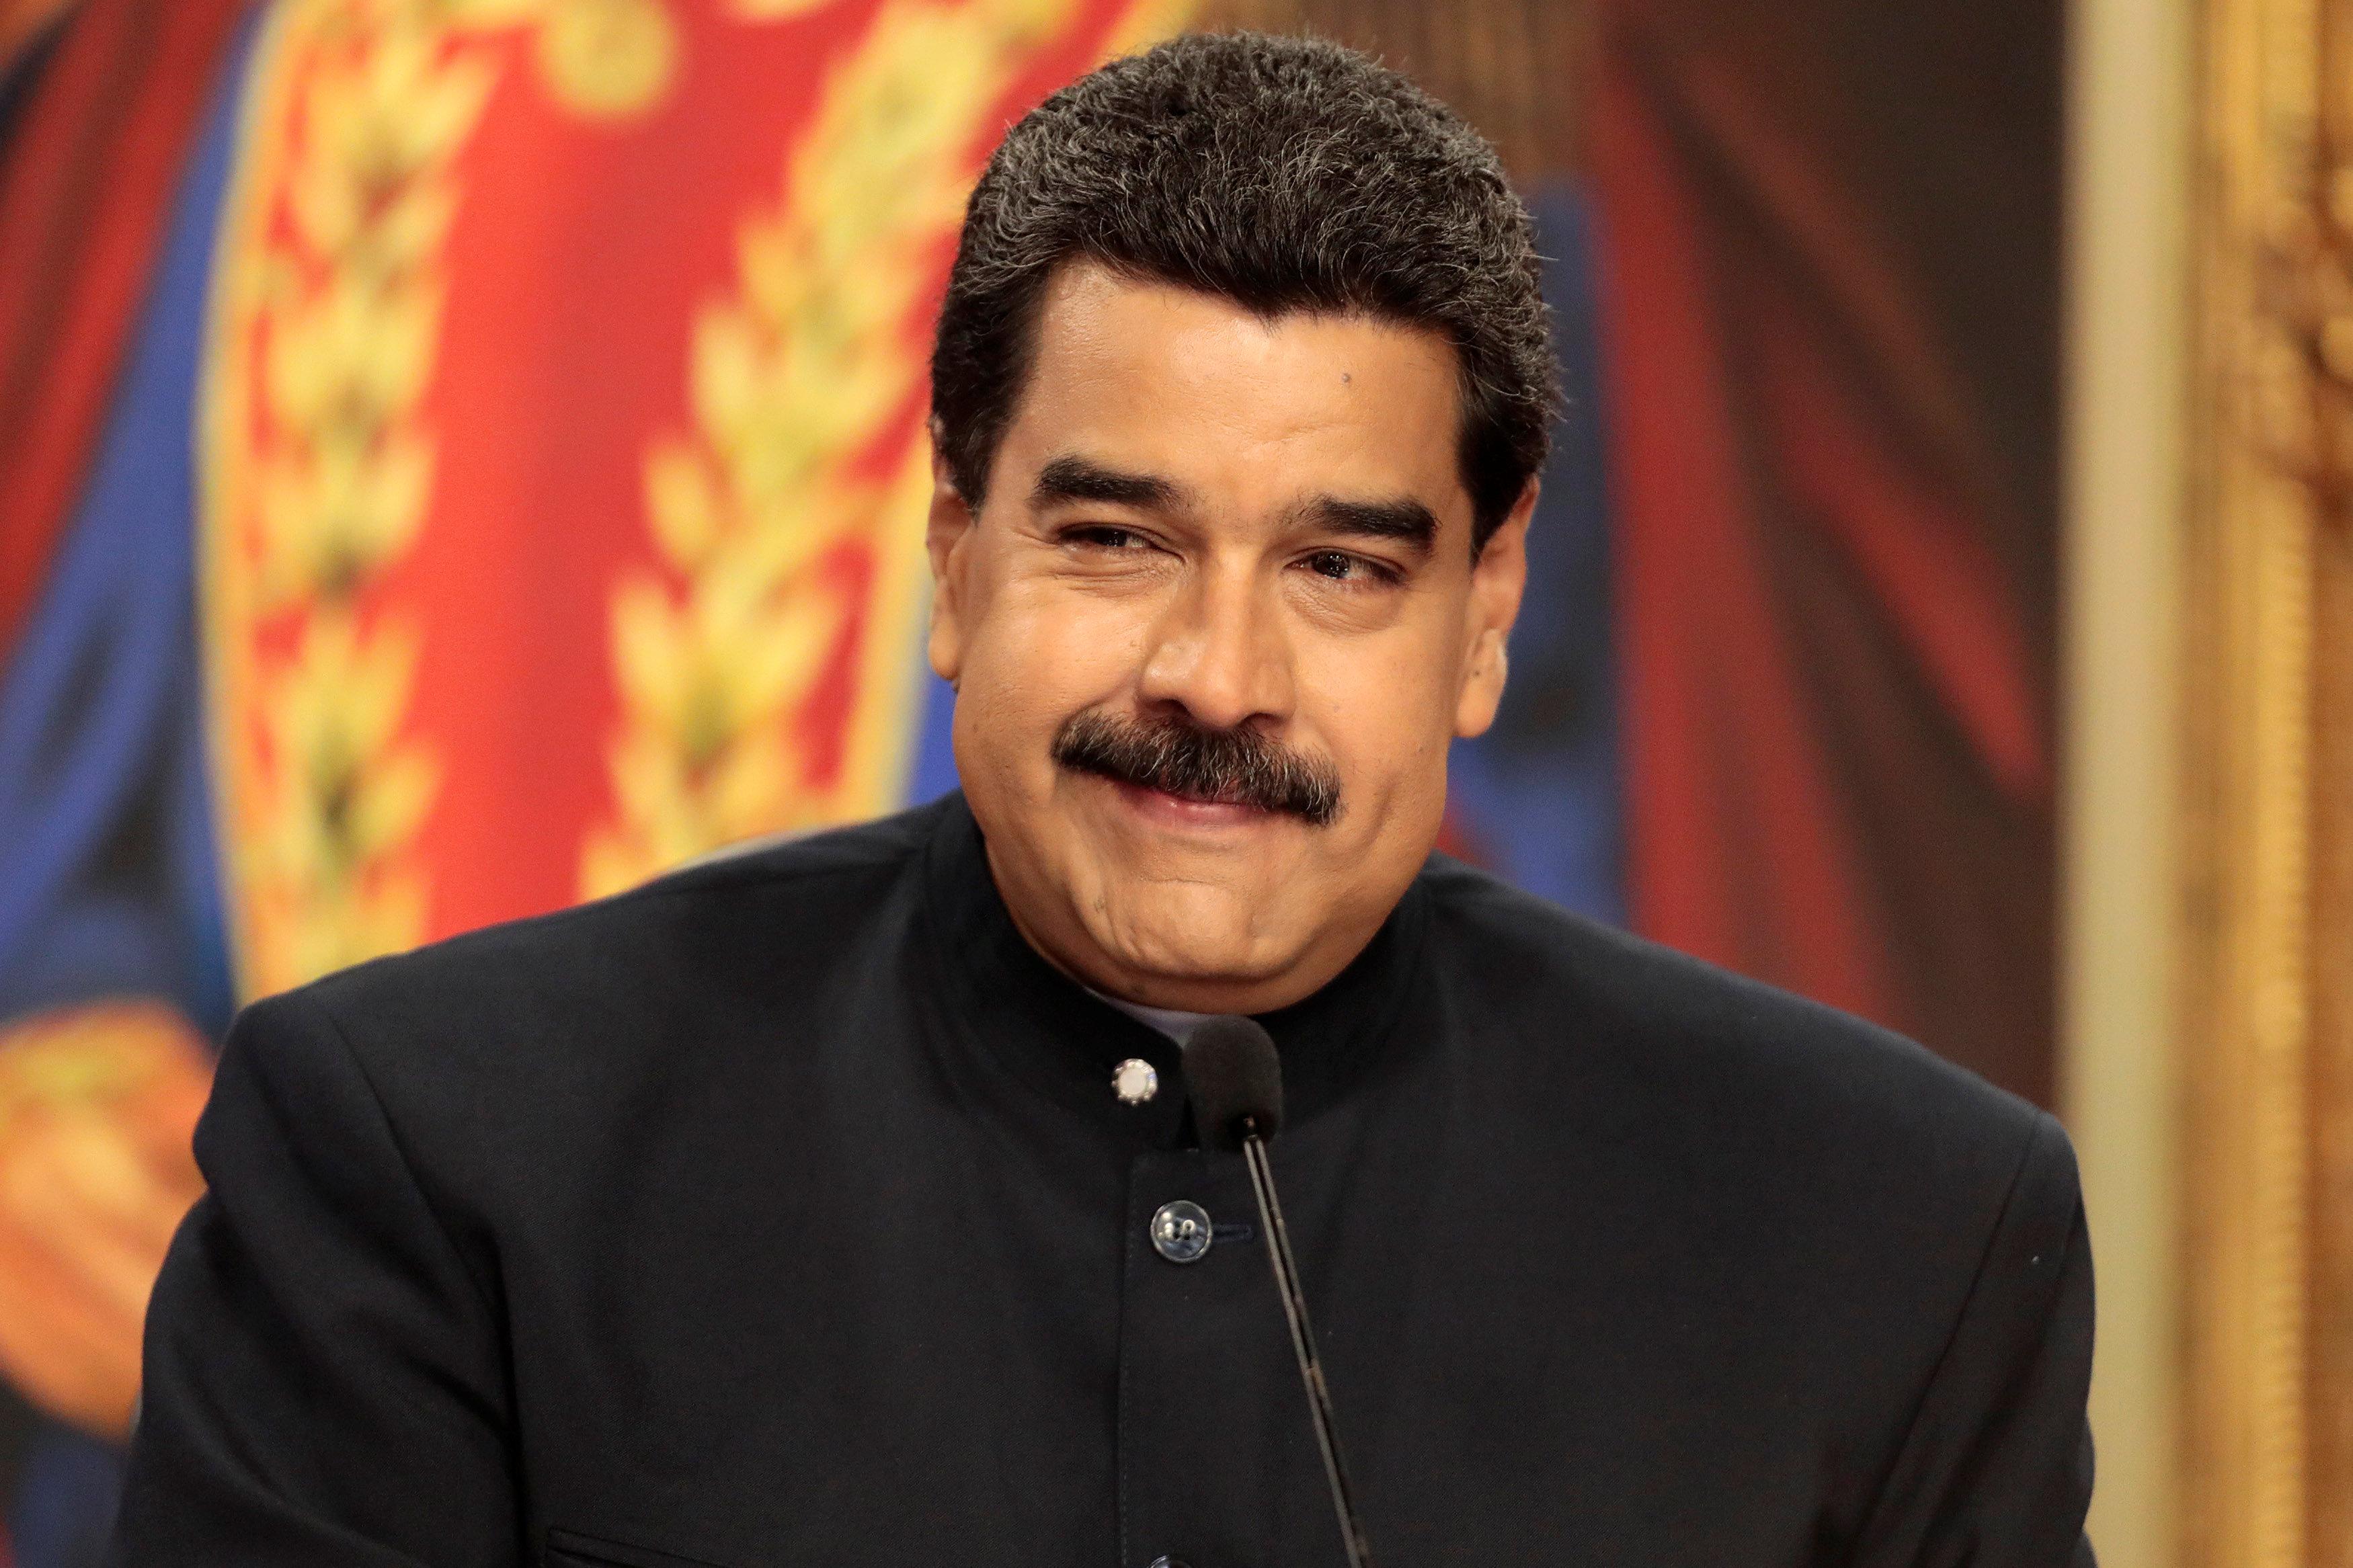 Venezuela's President Nicolas Maduro delivers a news conference at Miraflores Palace in Caracas, Venezuela August 22, 2017. REUTERS/Marco Bello